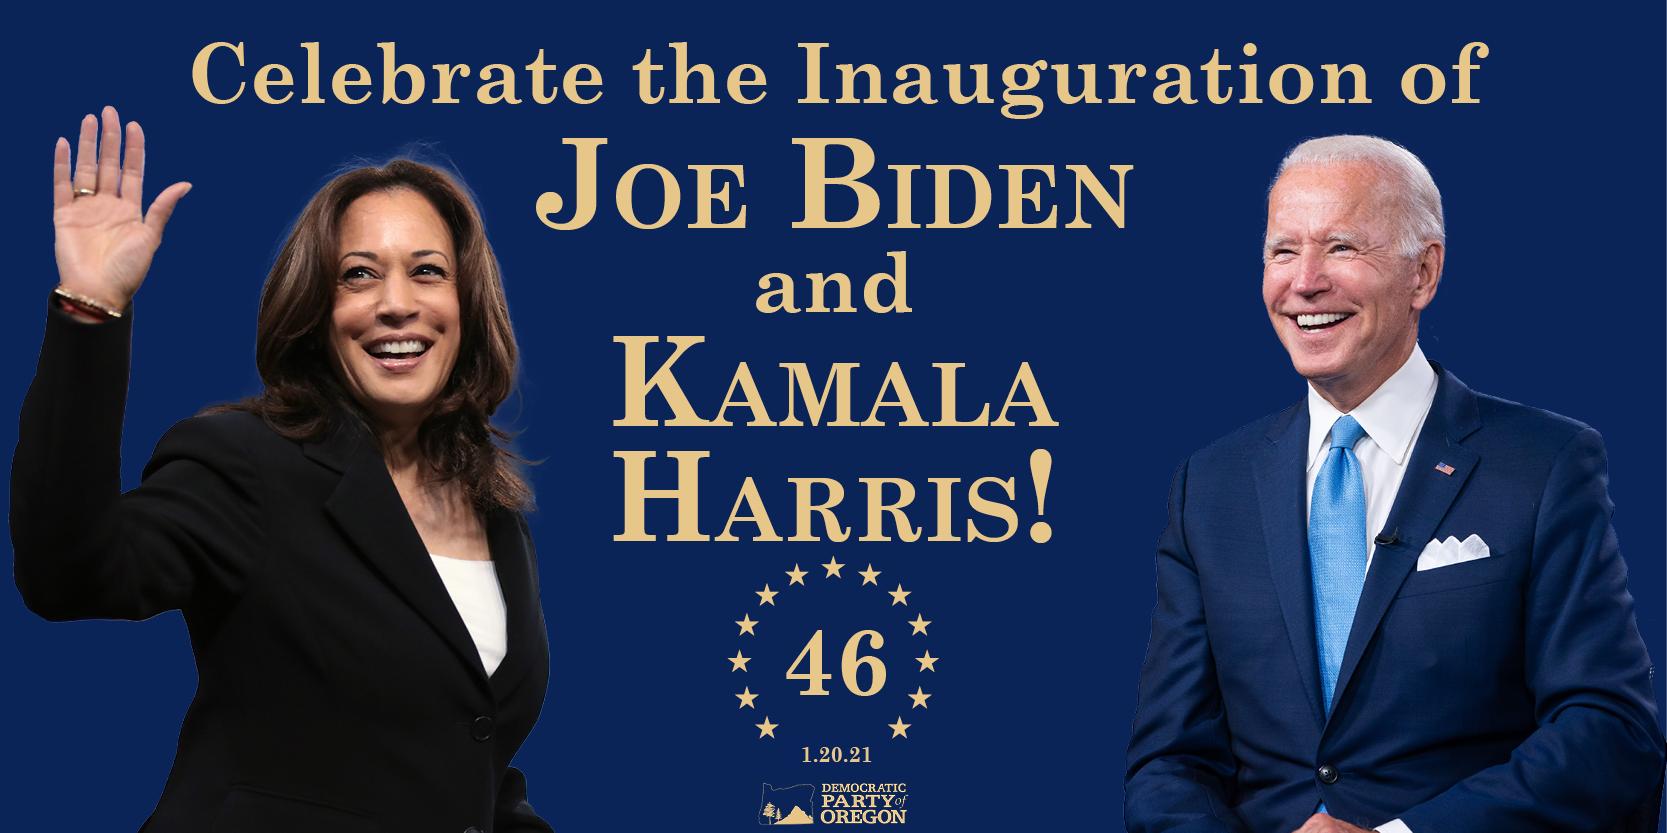 Inauguration of Joe Biden and Kamala Harris - Democratic Party of Oregon